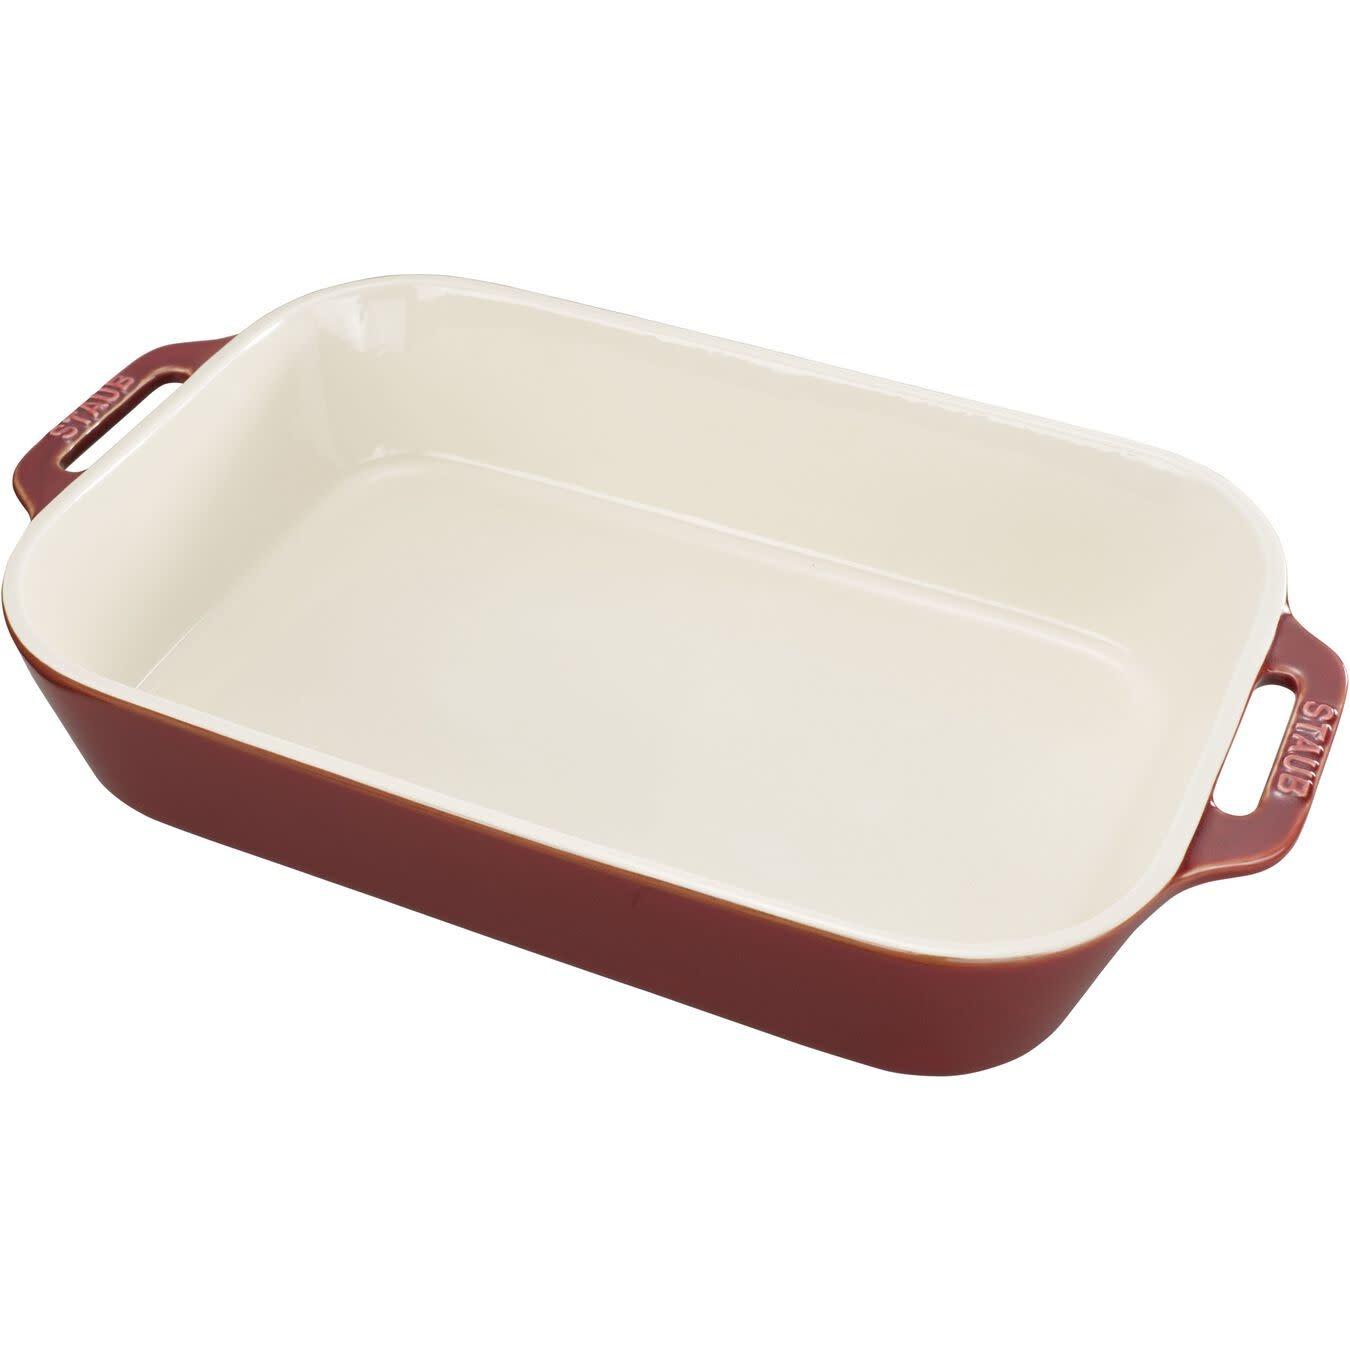 "Staub Rectangular Baking Dish Rustic Red 34x24cm / 13""x9"""